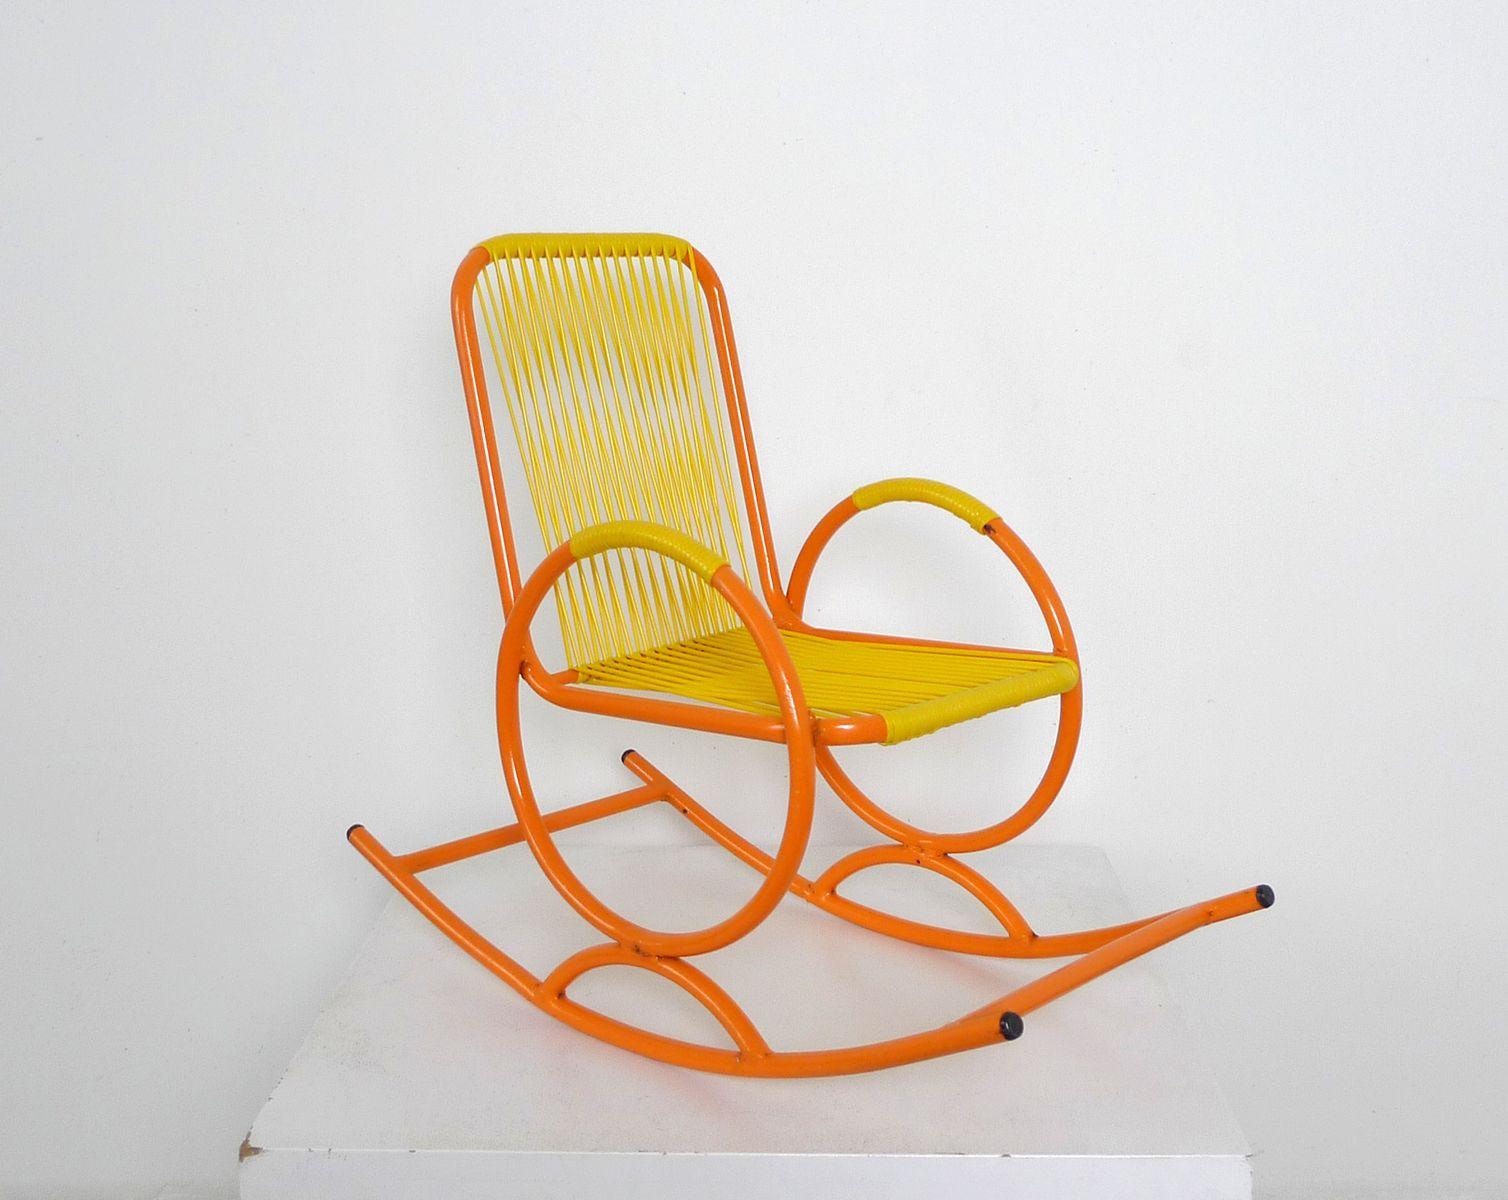 rocking chair d 39 enfant orange italie en vente sur pamono. Black Bedroom Furniture Sets. Home Design Ideas